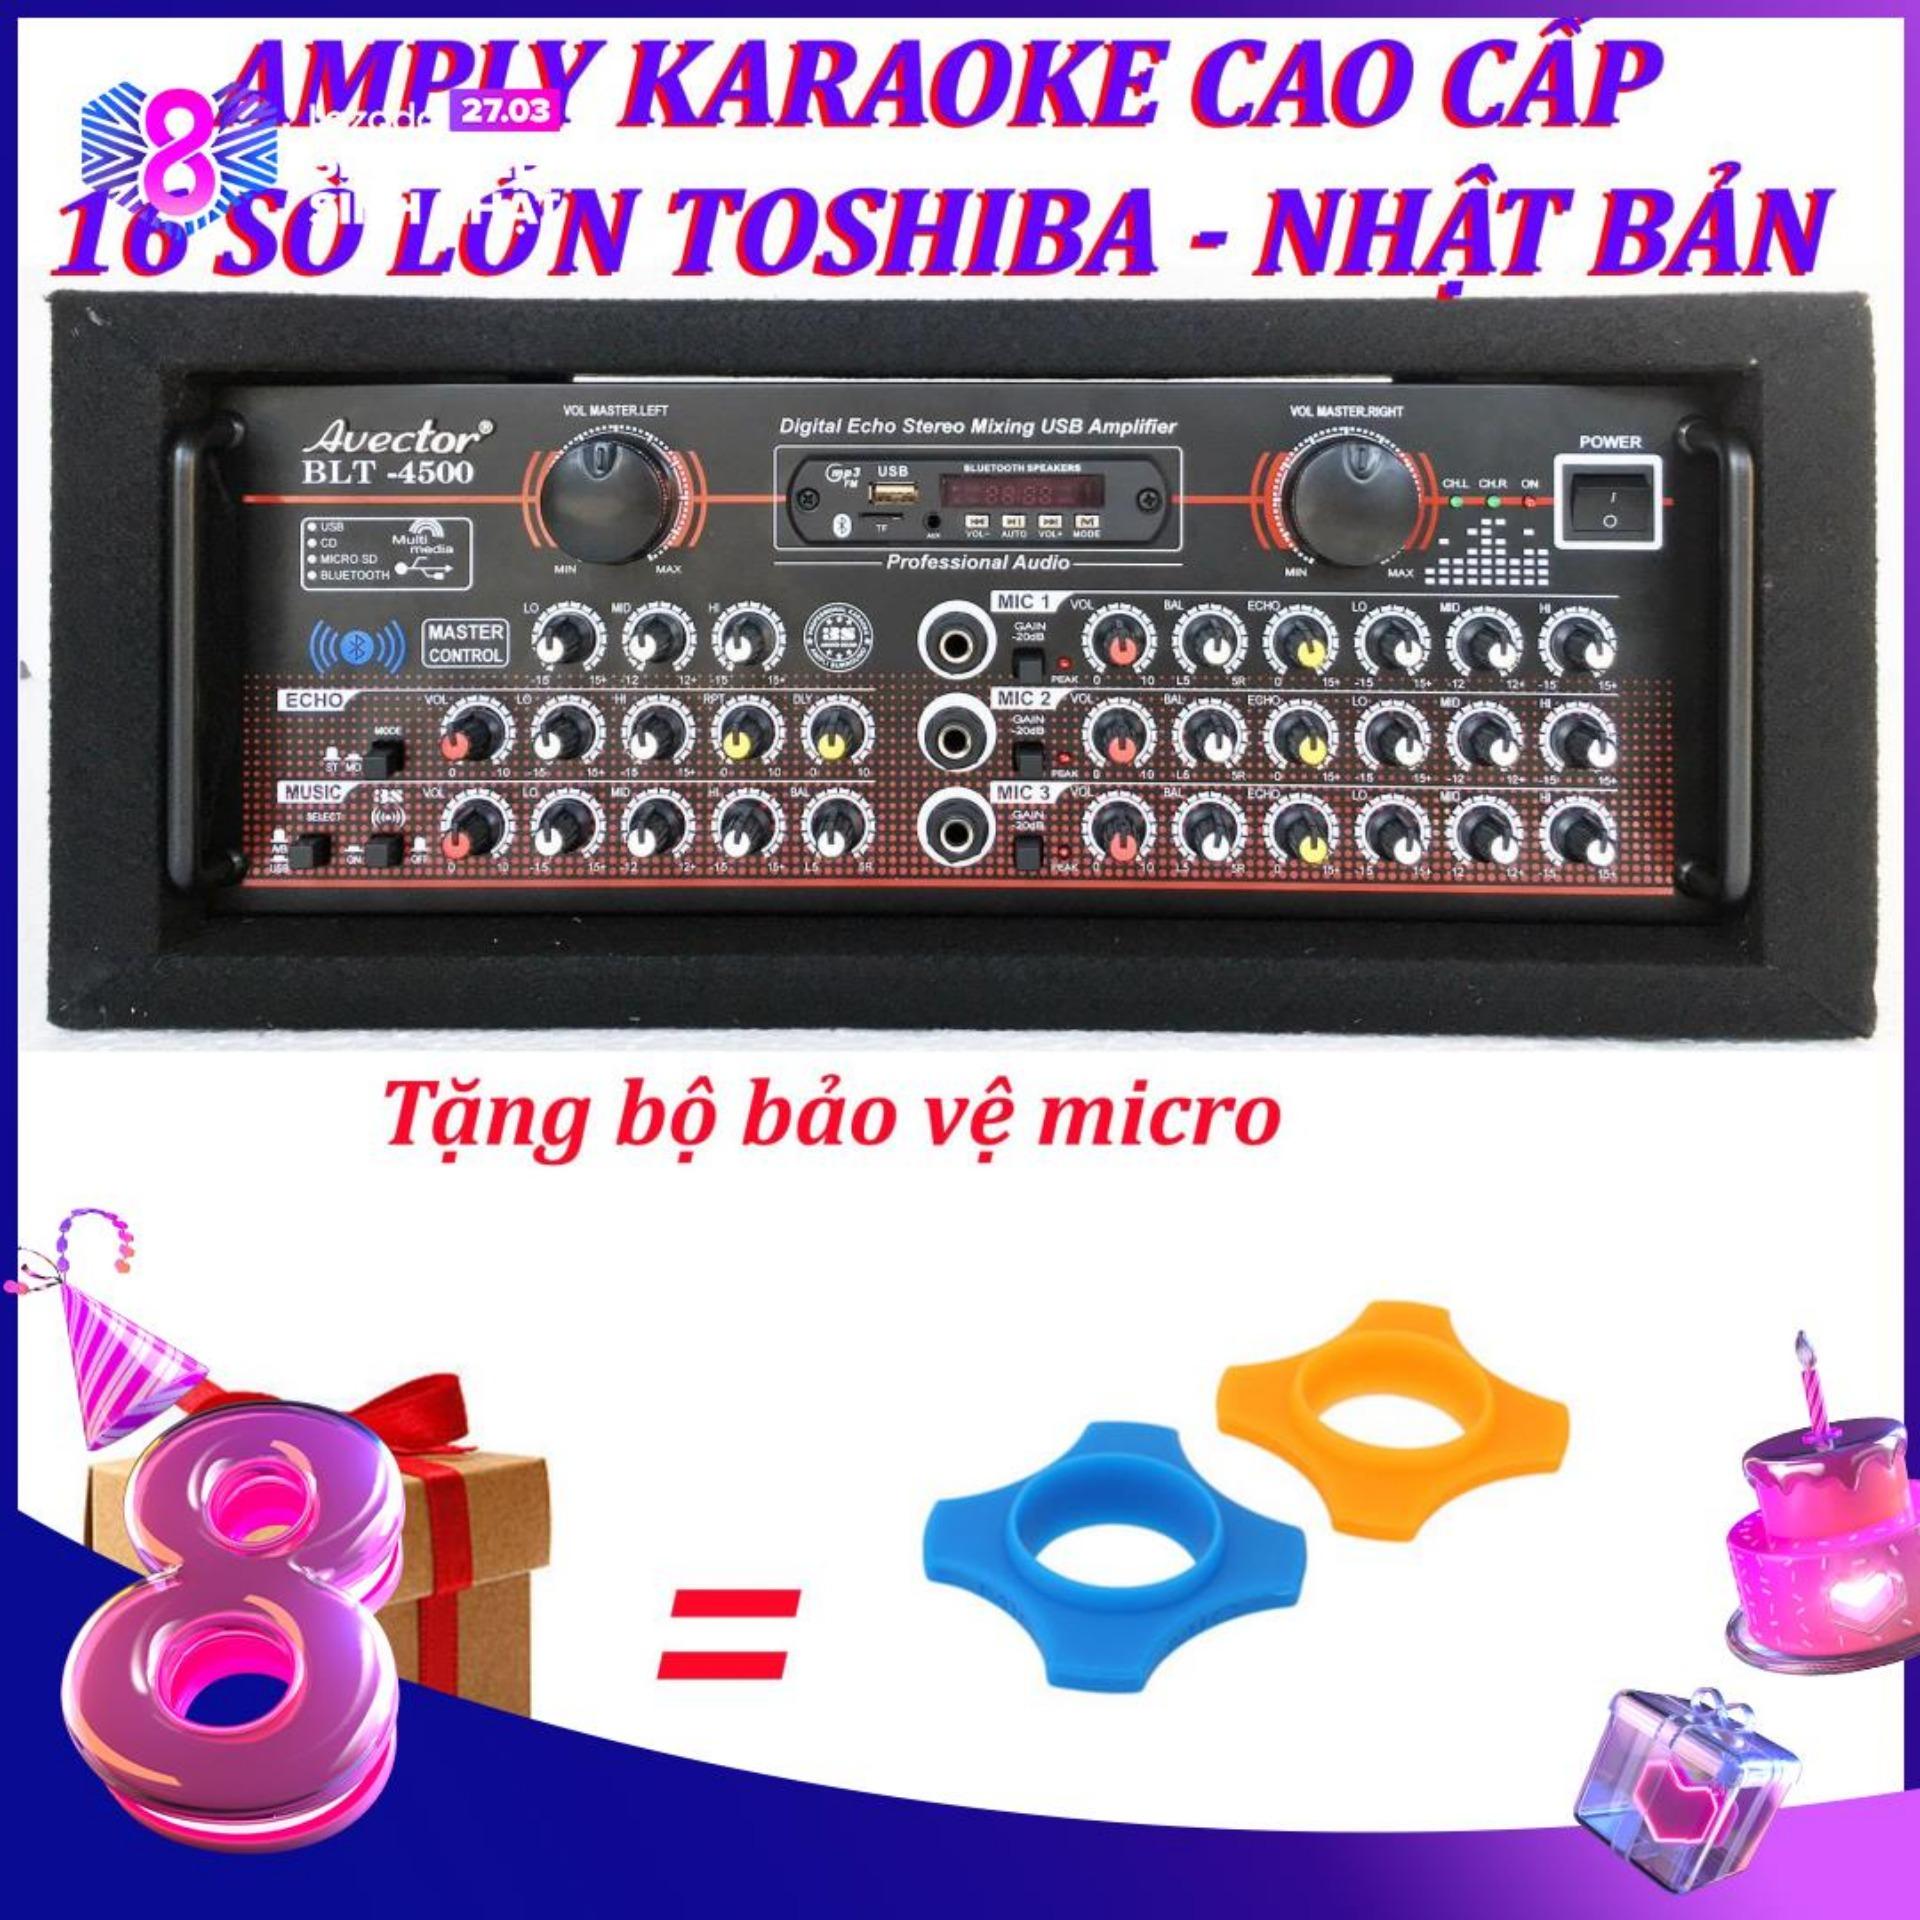 Amply karaoke ampli bluetooth amply nghe nhac amply karaoke hay cao cấp avector 4500 tặng bộ bảo vệ micro